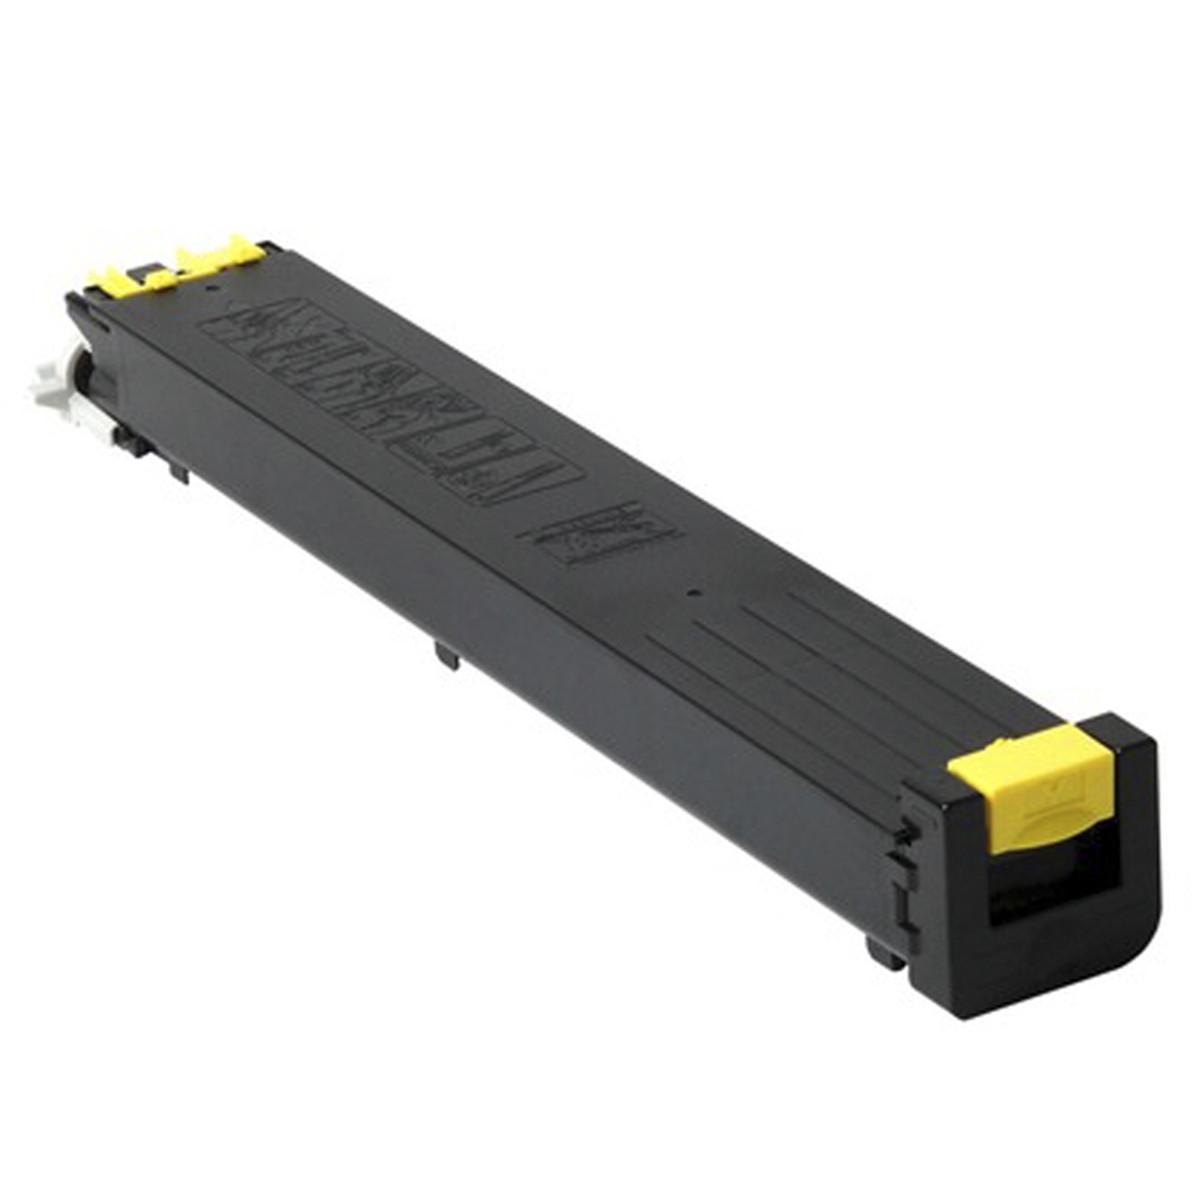 Toner Sharp MX-51BTYA MX-51NTYA Amarelo | MX4110 MX4111 MX5110 MX5111 | Katun Business Color 340g